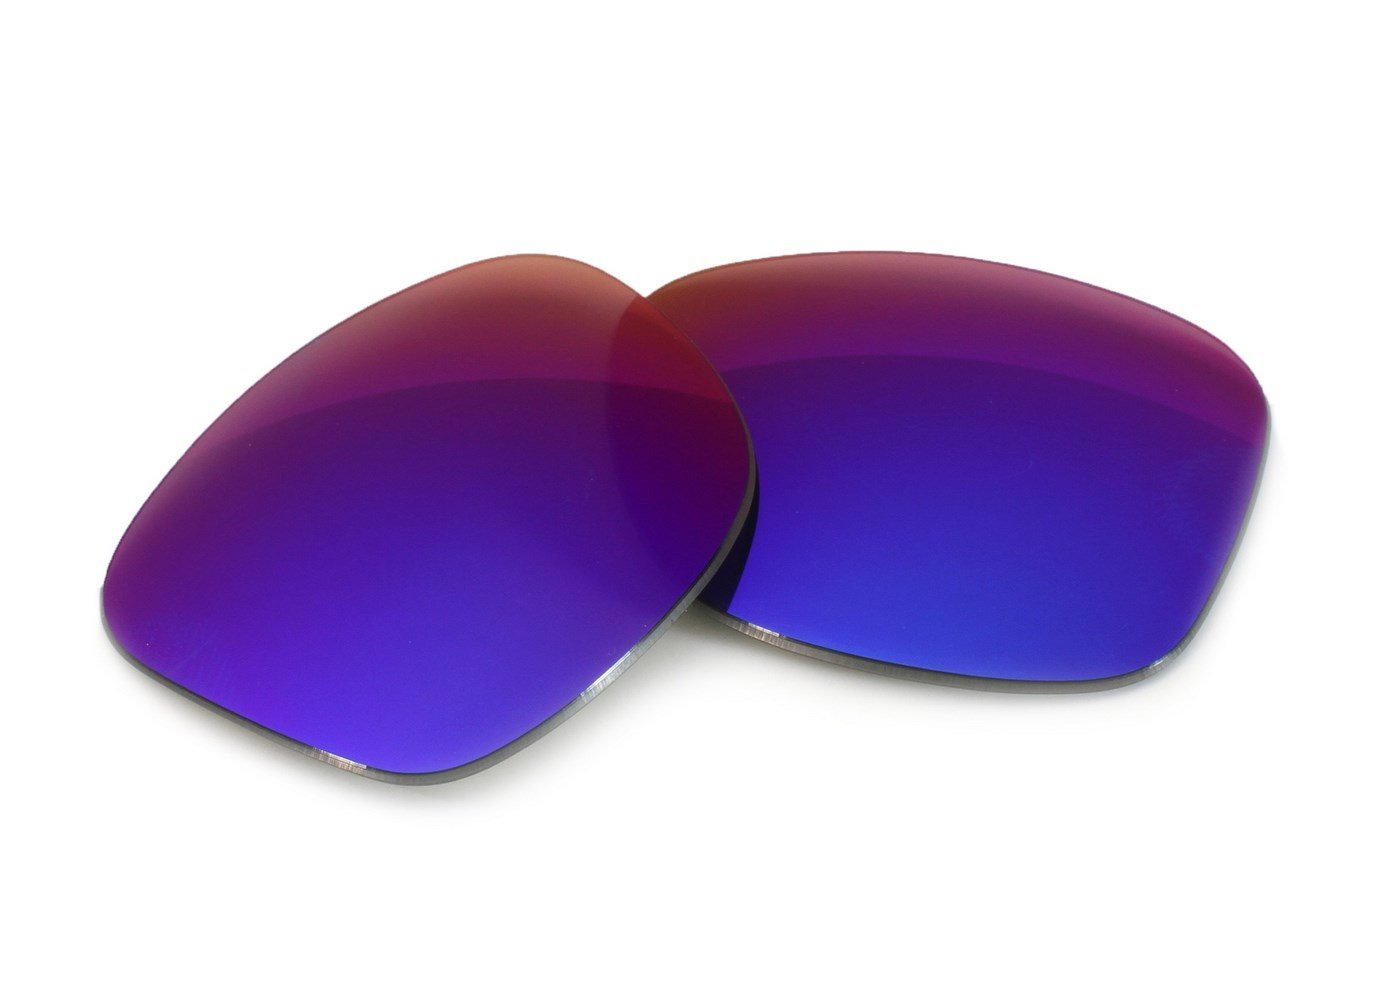 Fuse Lenses for Von Zipper Dipstick - Cosmic Mirror Tint